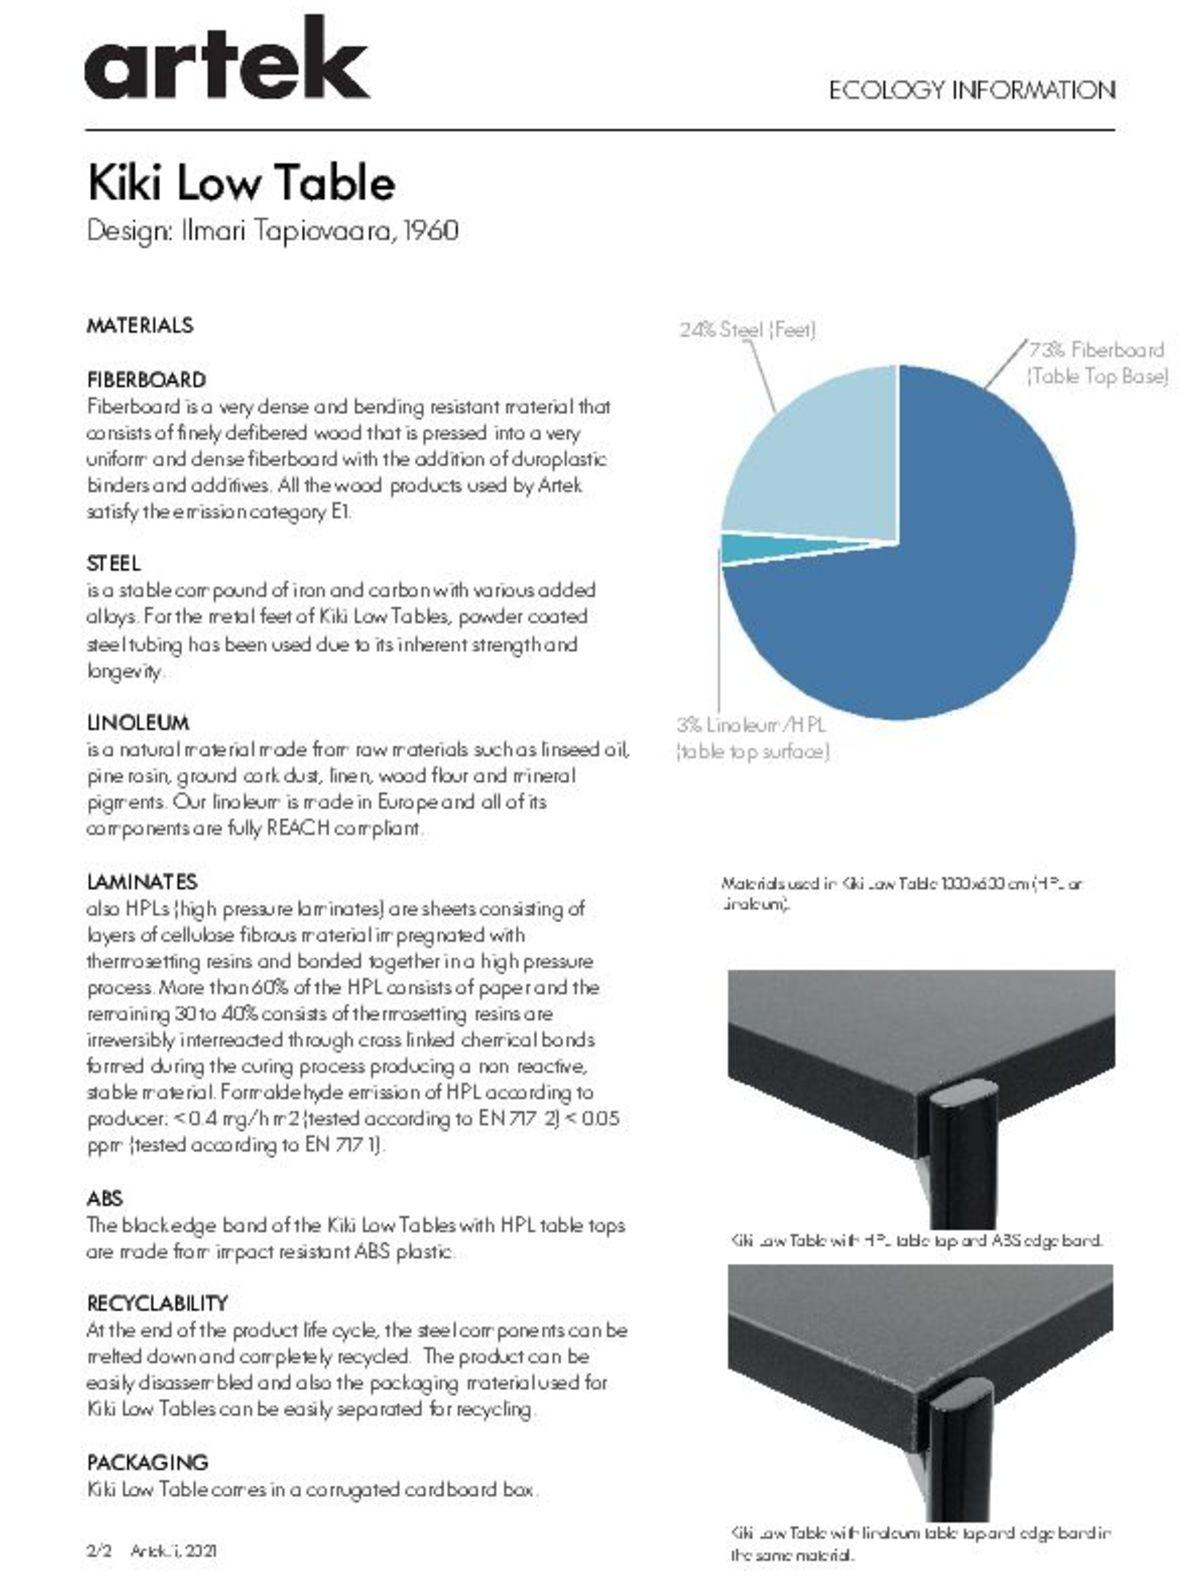 Ecology-Document_Kiki_Low_Table-130826122